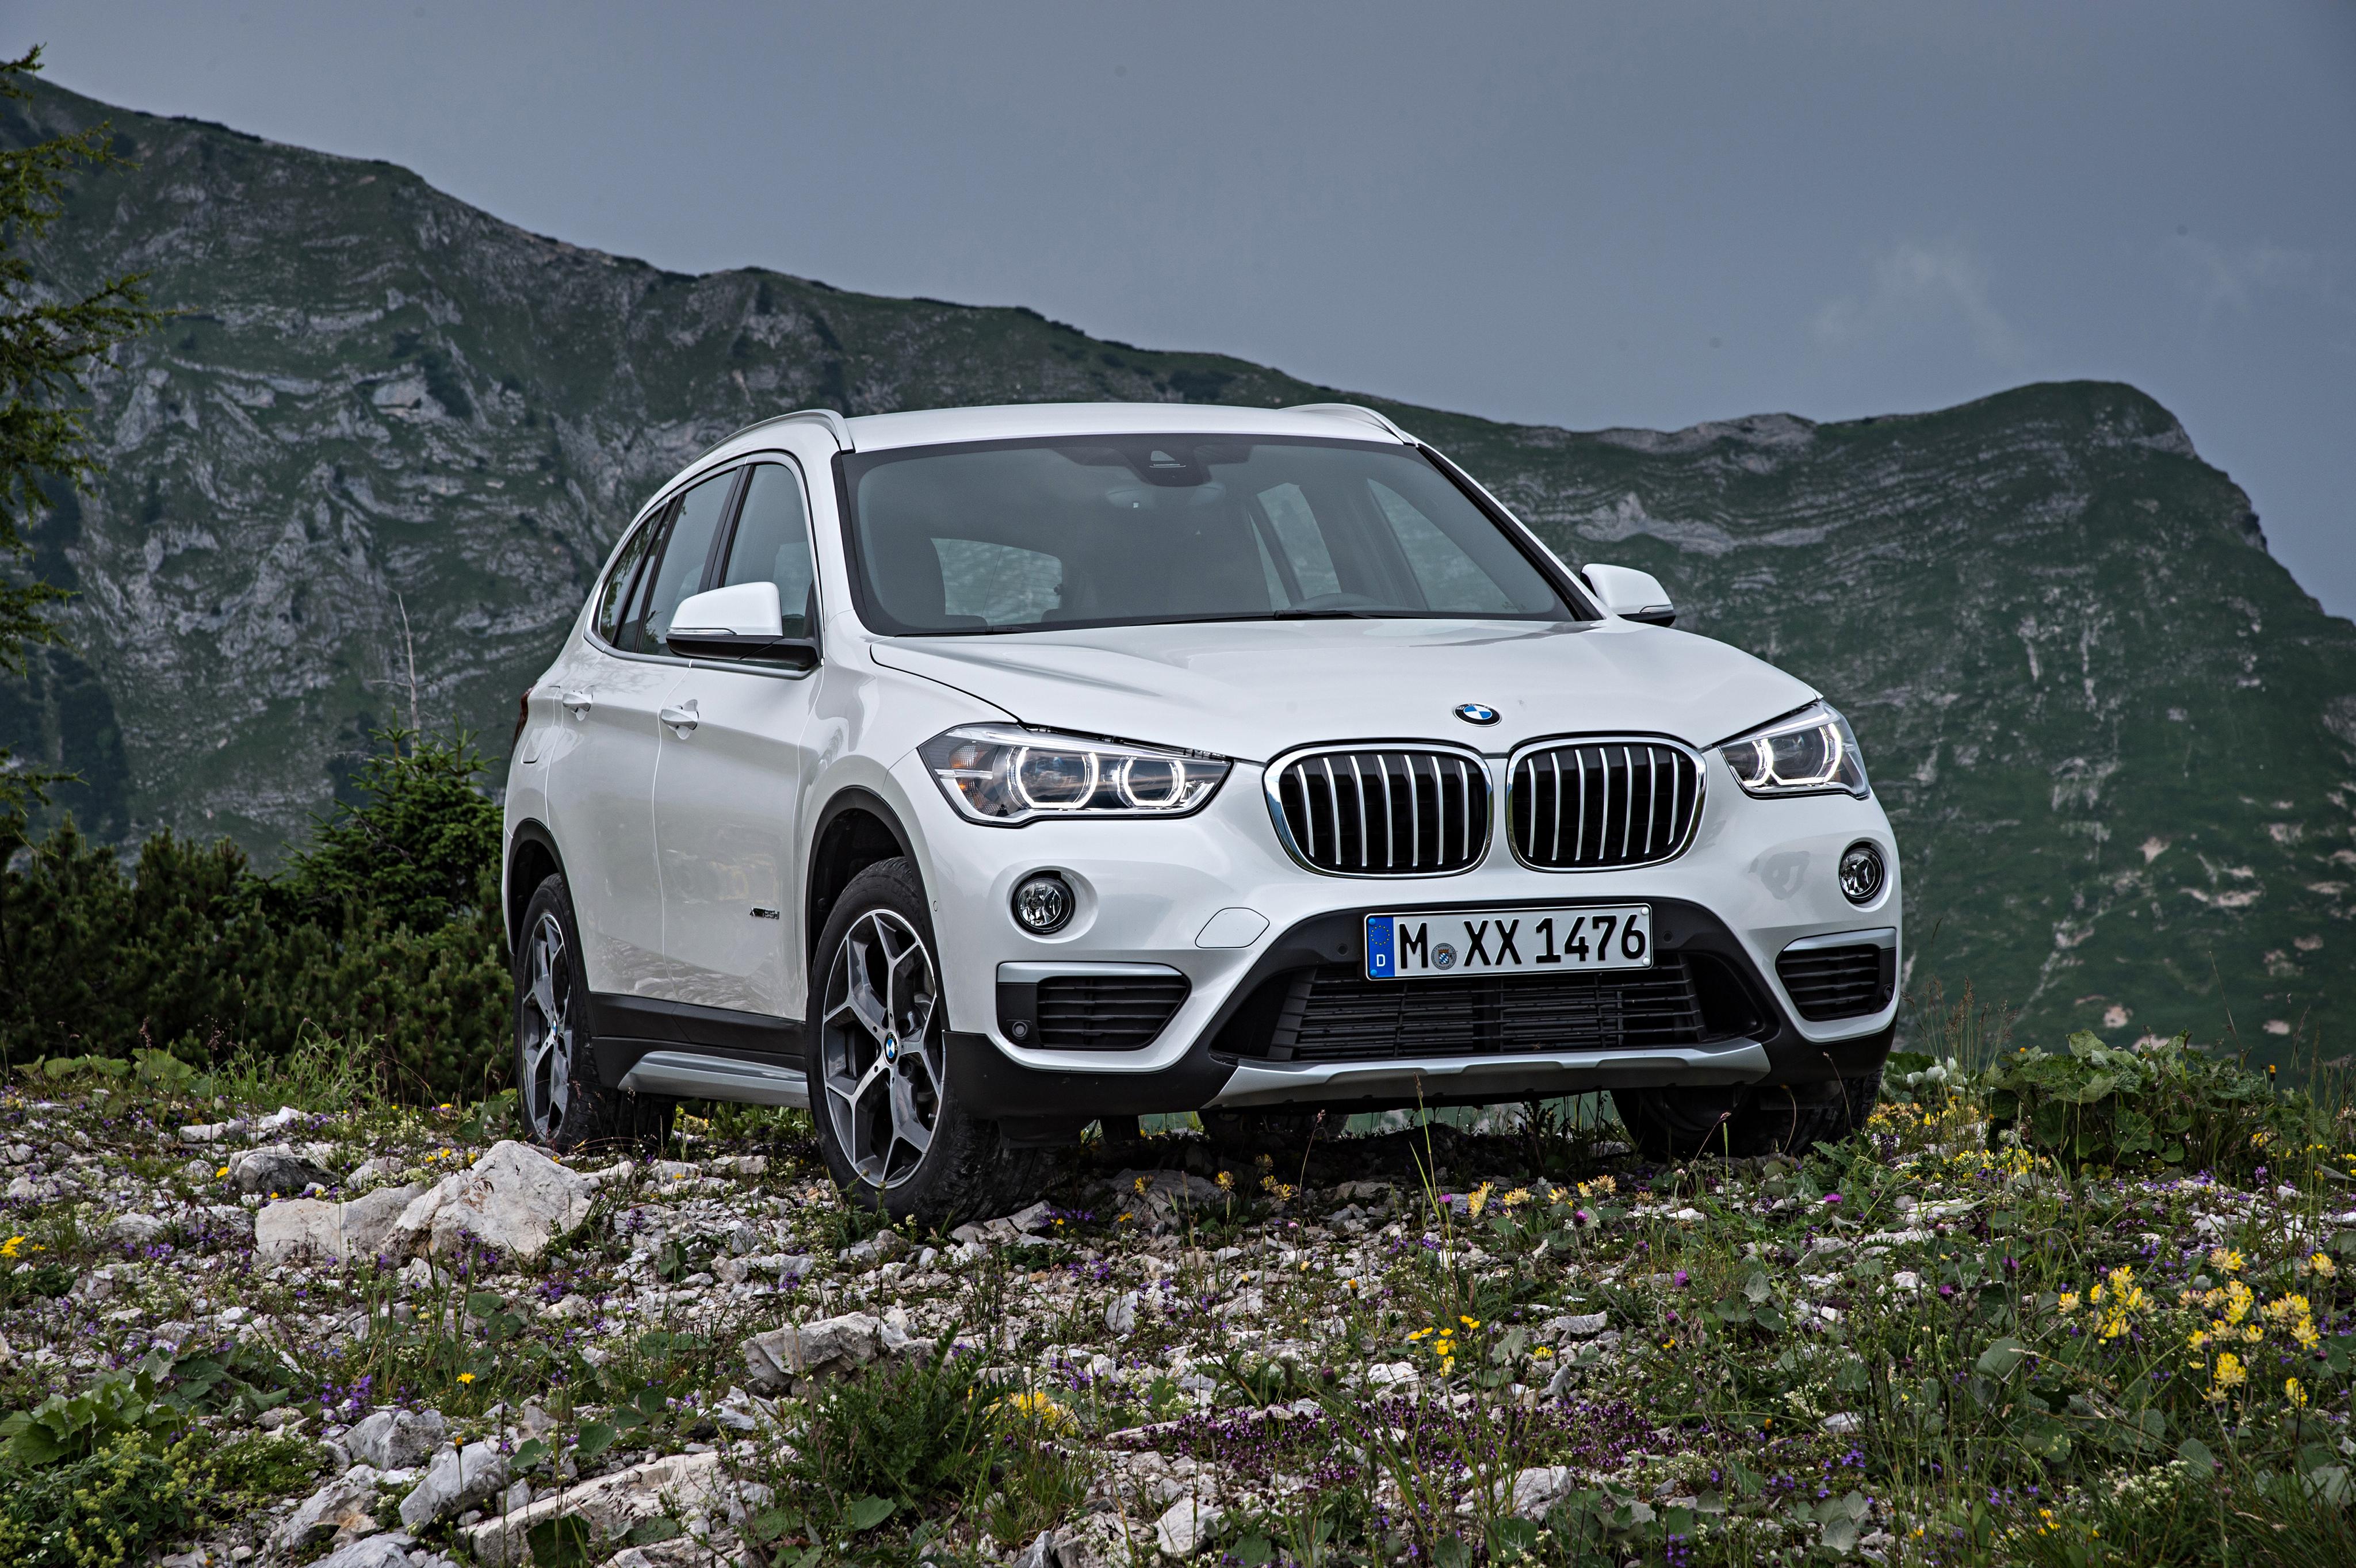 BMW X1 4k Ultra HD Wallpaper | Background Image ...